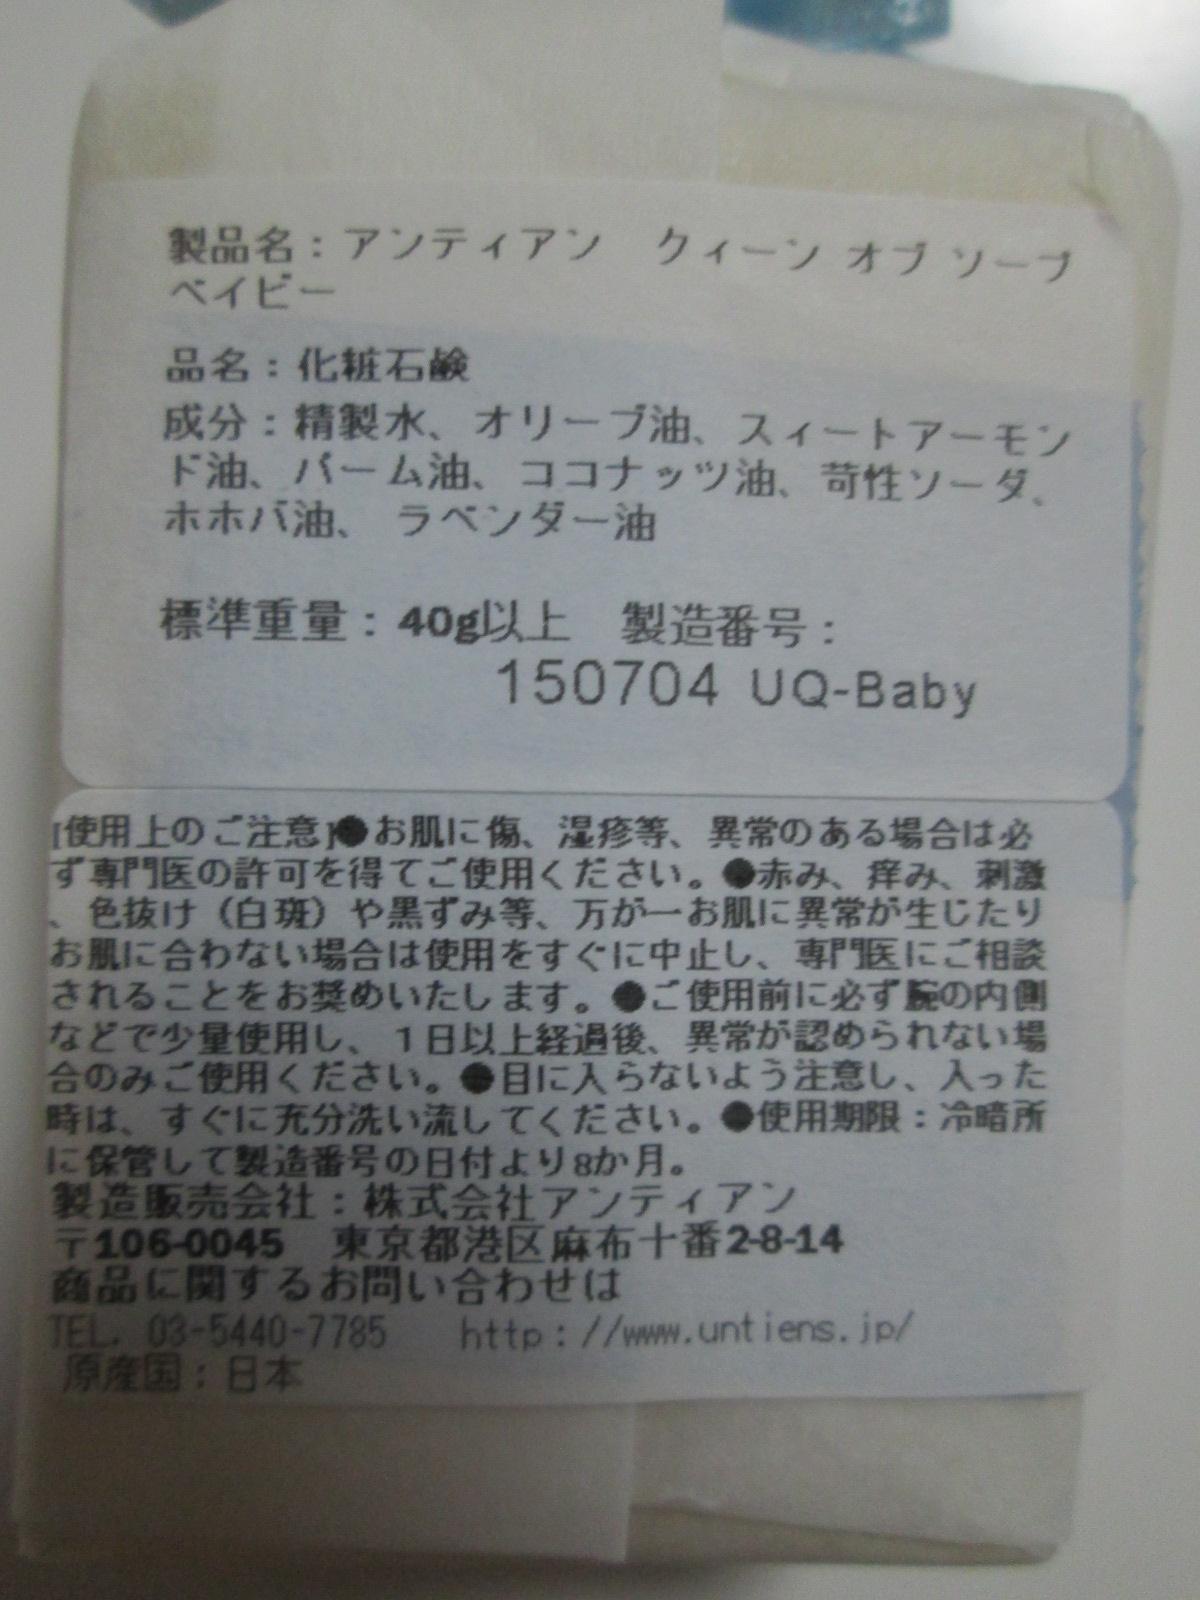 IMG_8304 クイーンオブソープ ベイビー (6)